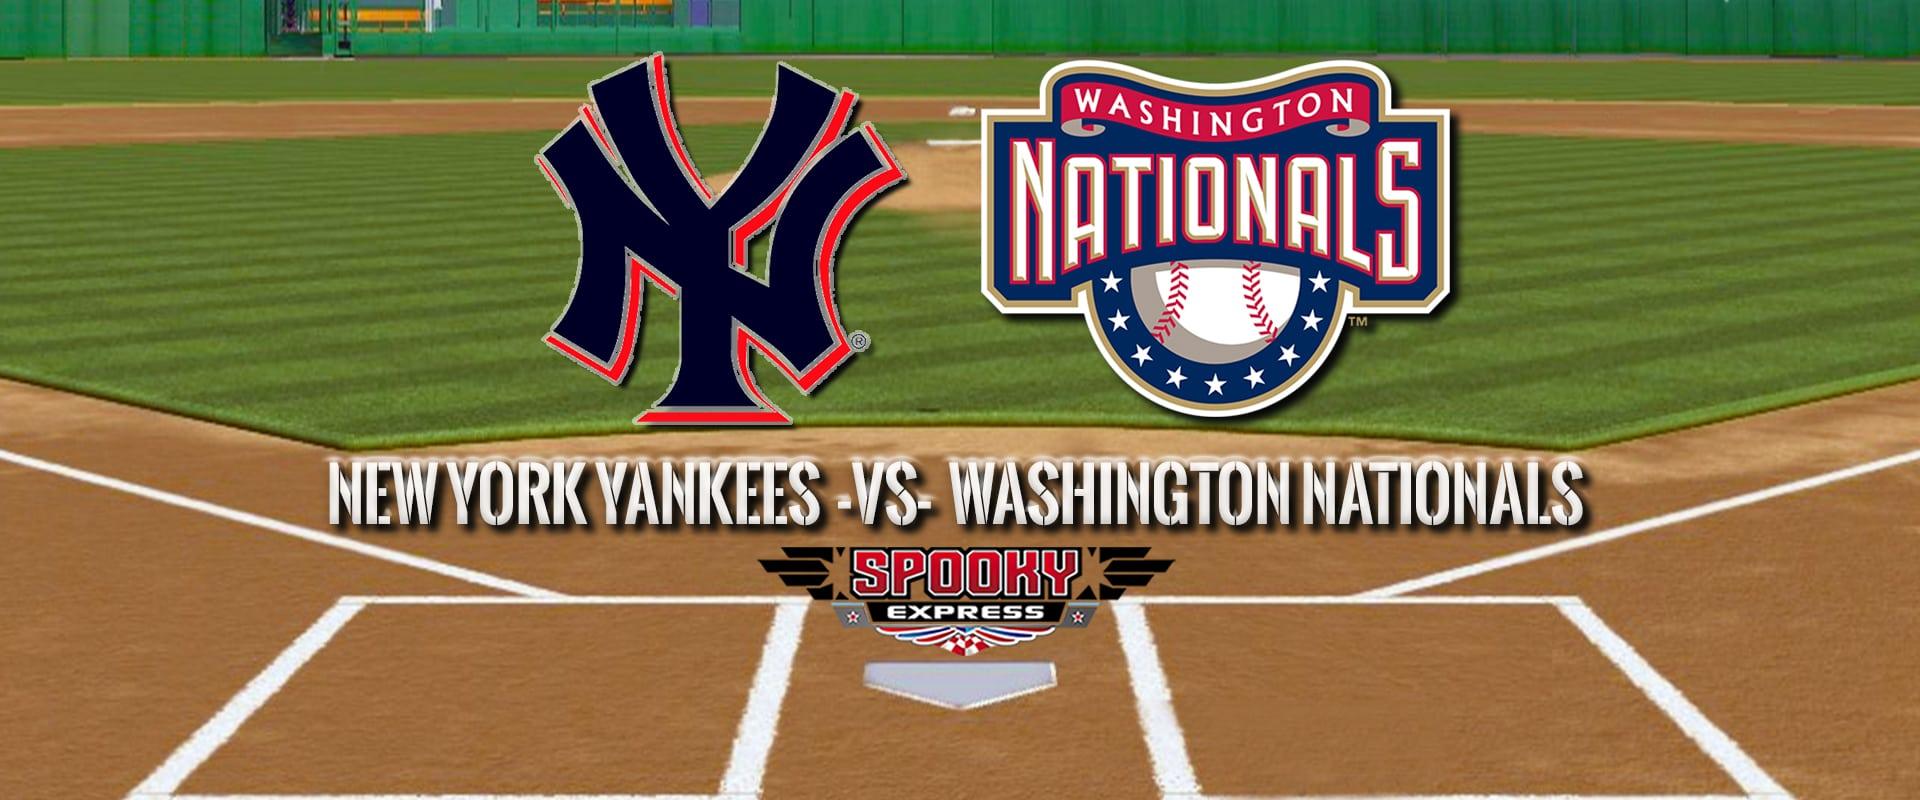 MLB Betting Preview: Washington Nationals vs. New York